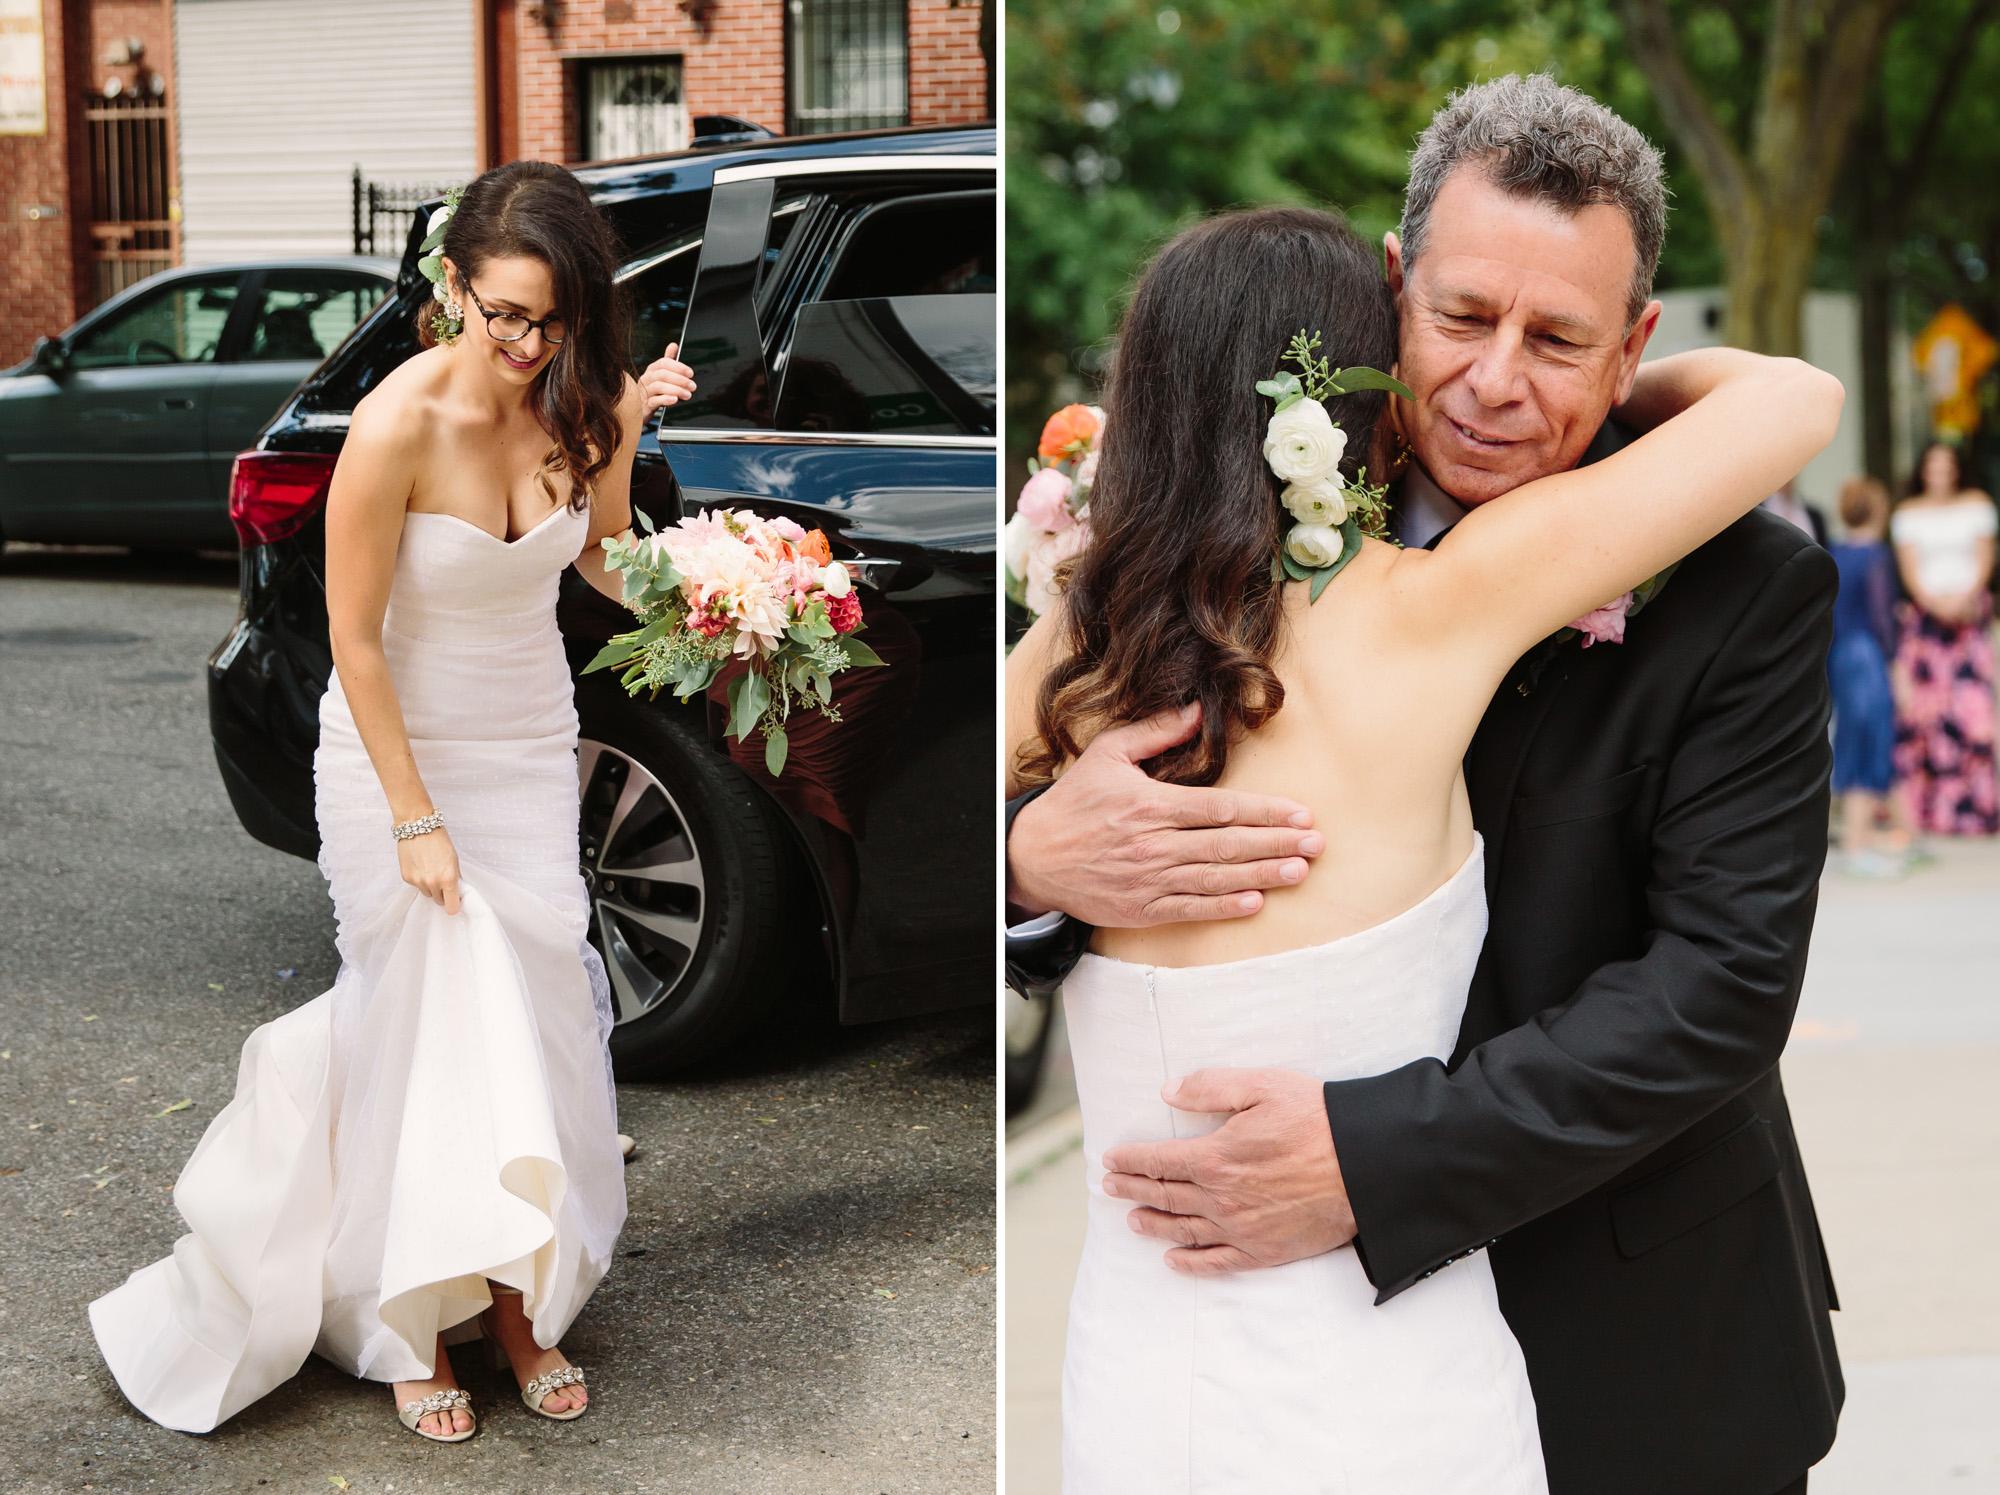 16_Kate_Sam_Picnic_House_Wedding_Brooklyn_NY_Tanya_Salazar_Photography.jpg